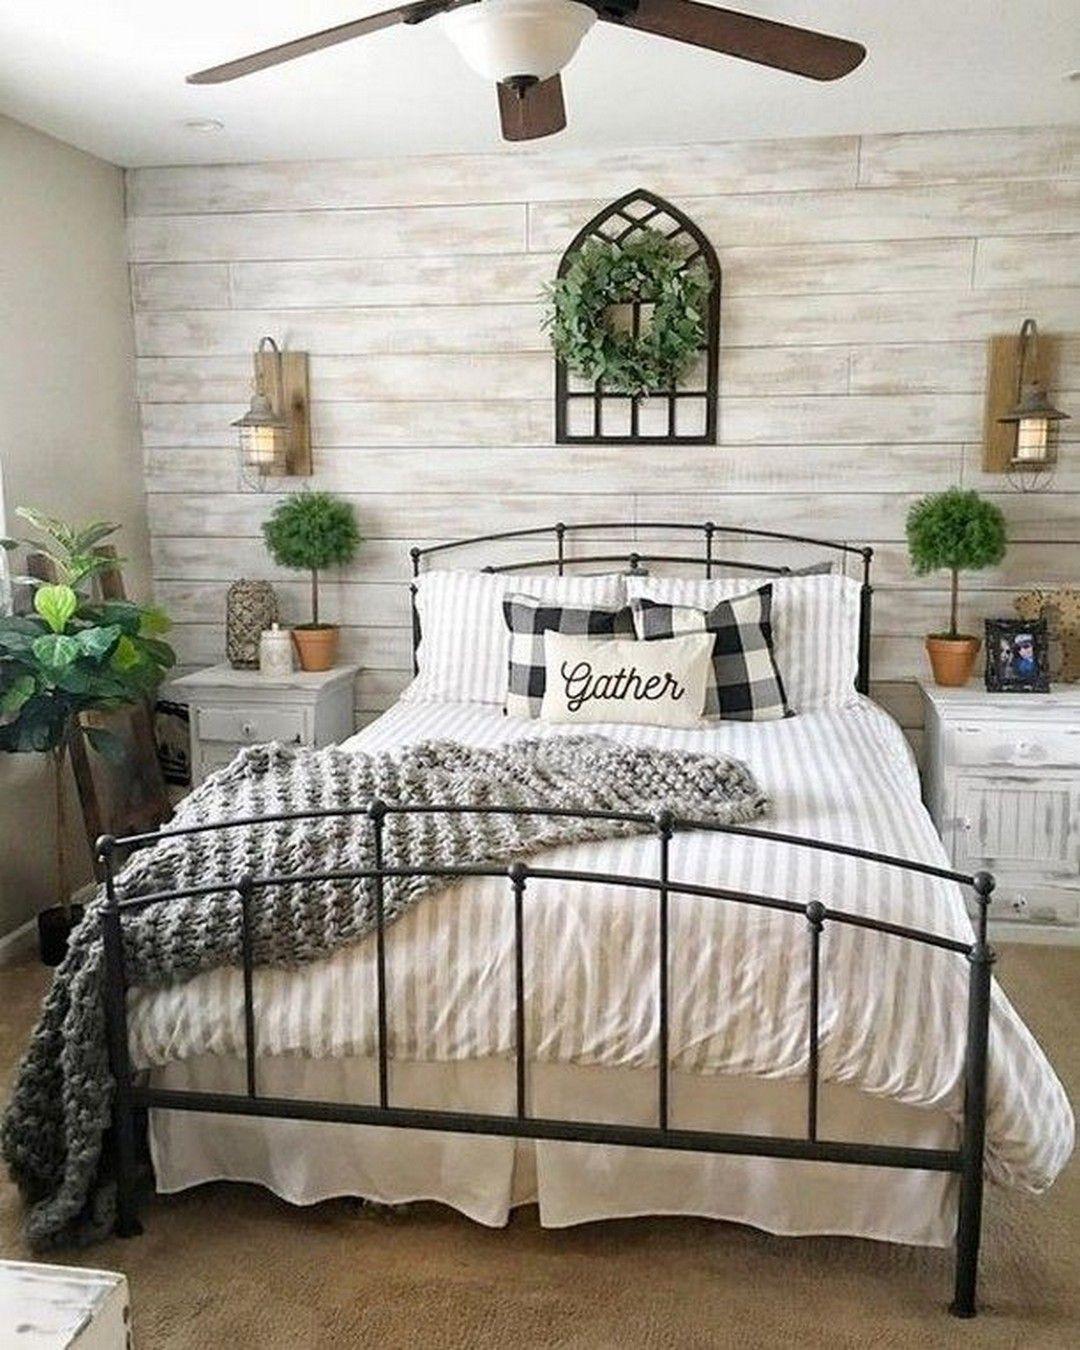 40 Amazing Farmhouse Style Master Bedroom Ideas Http Alladecor Com 2019 03 22 40 Amazi Farmhouse Style Master Bedroom Farmhouse Bedroom Decor Remodel Bedroom